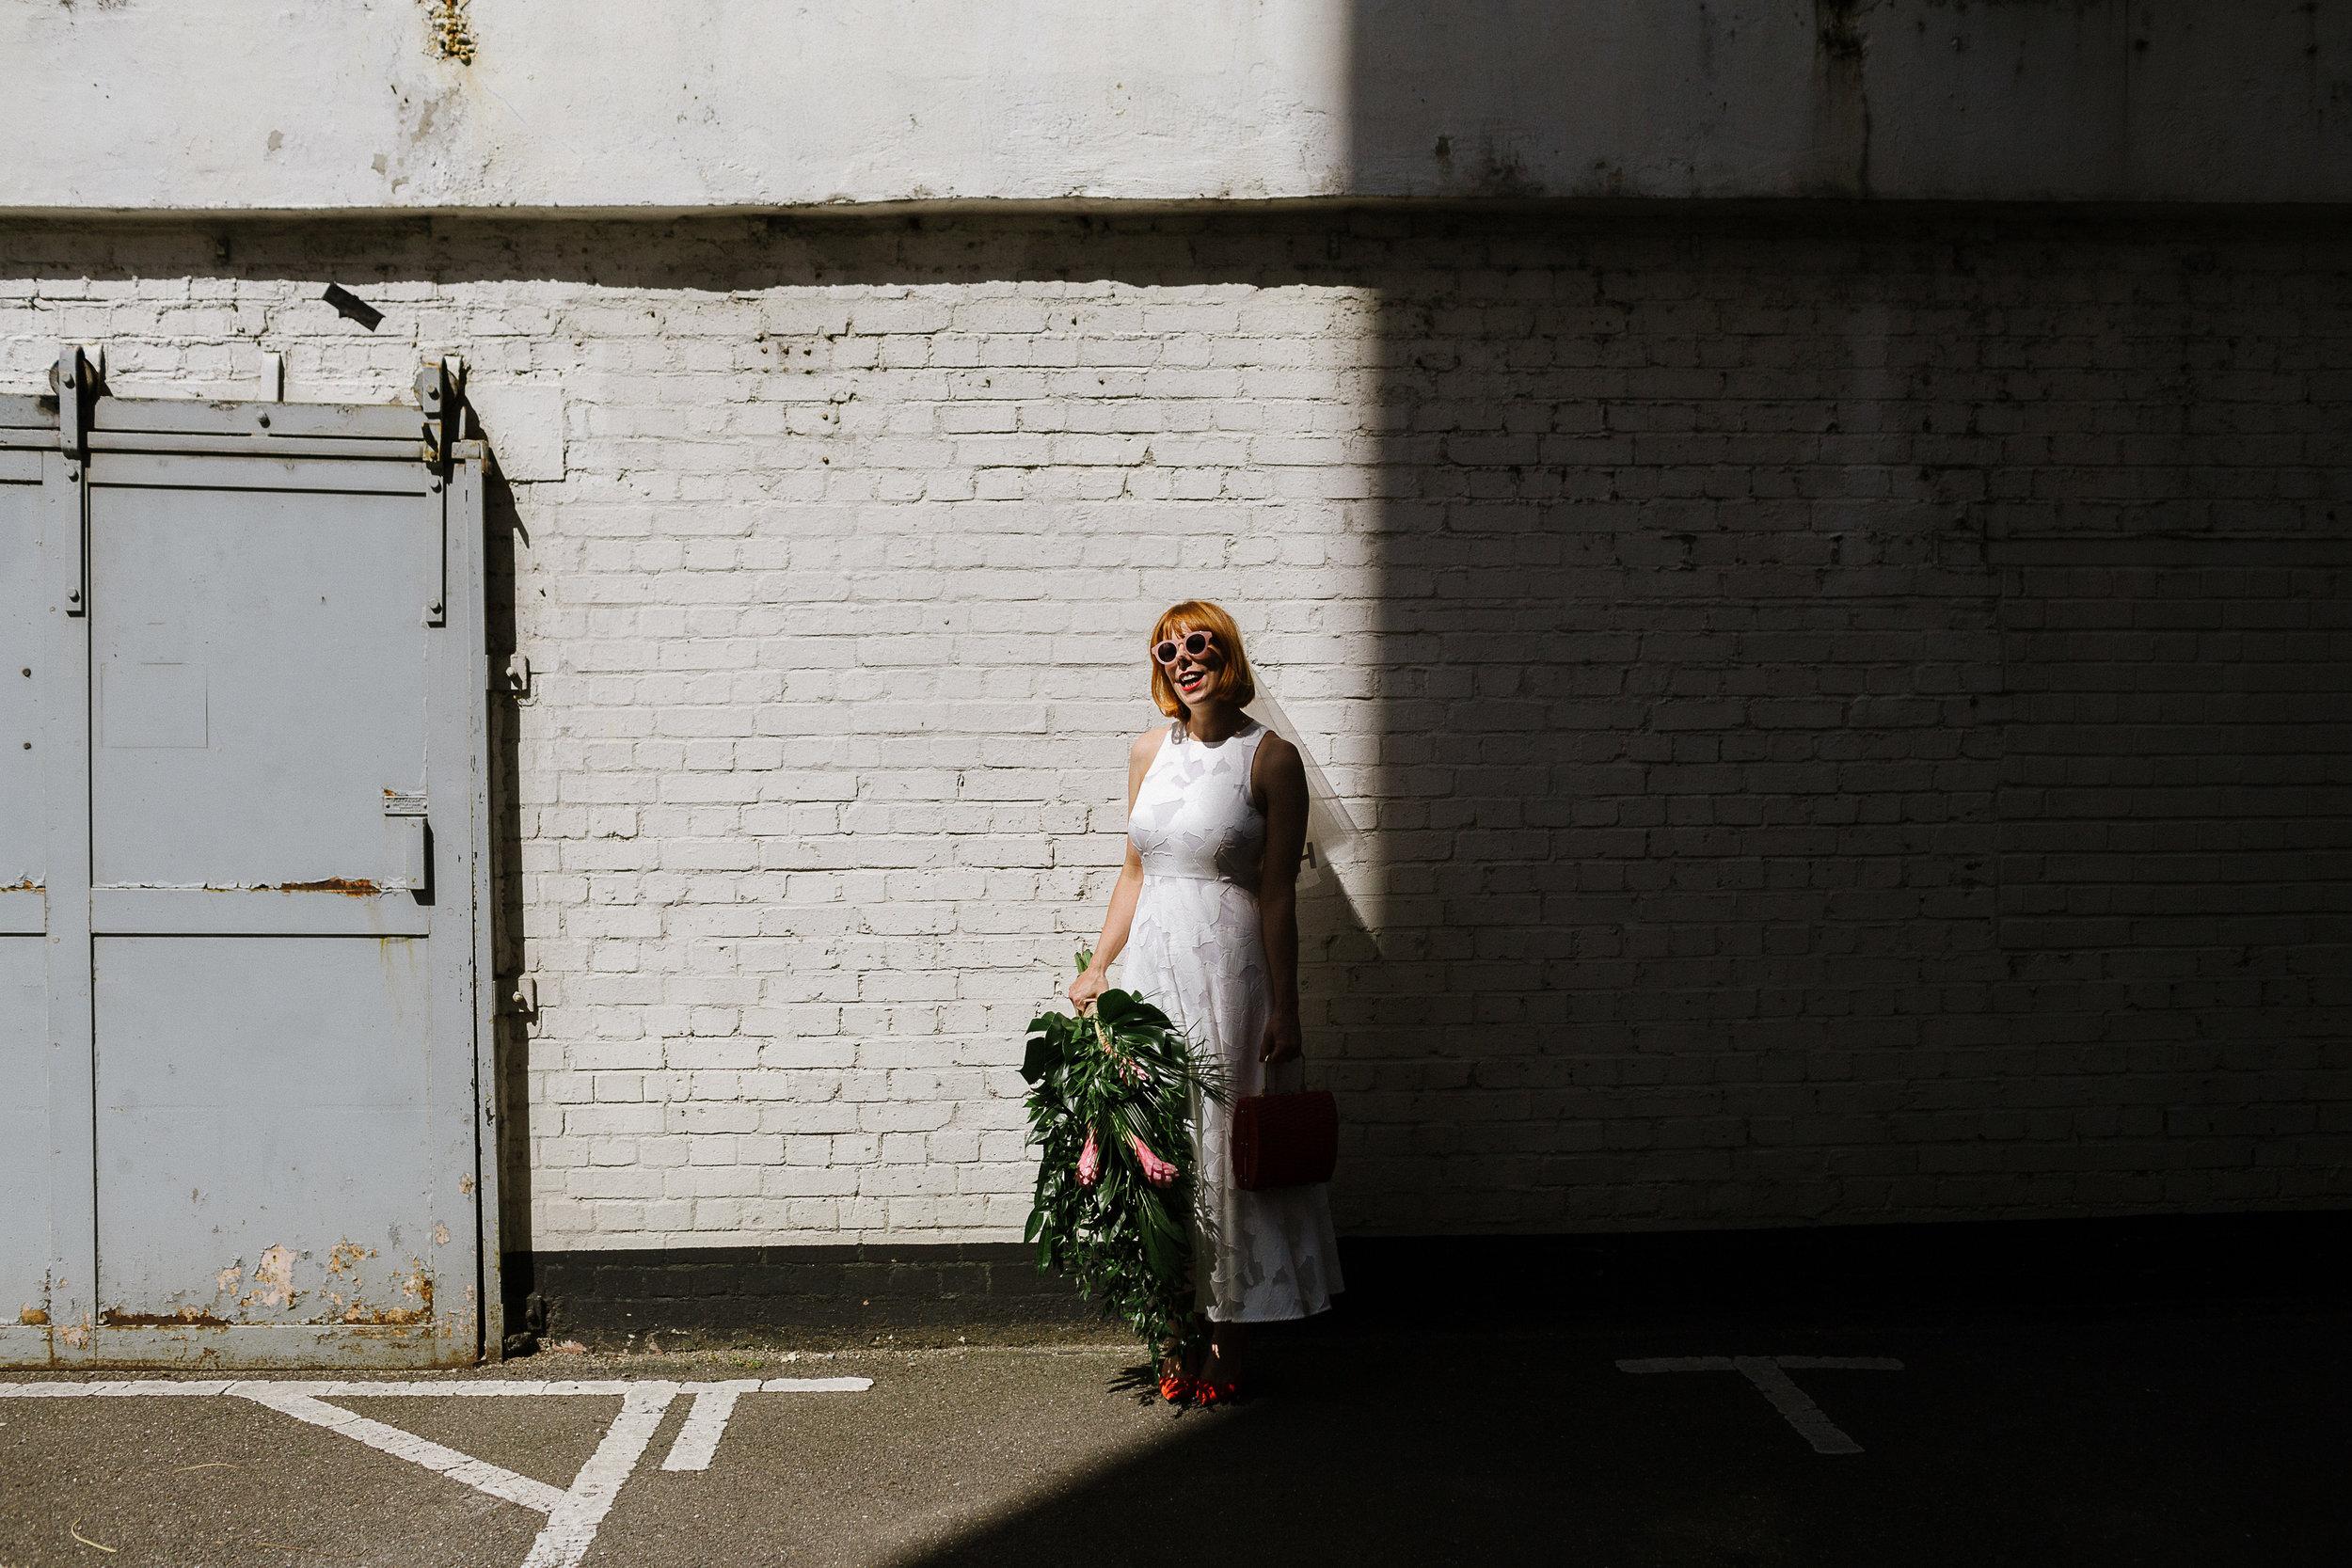 Islington_Town_Hall_Wedding_14.JPG